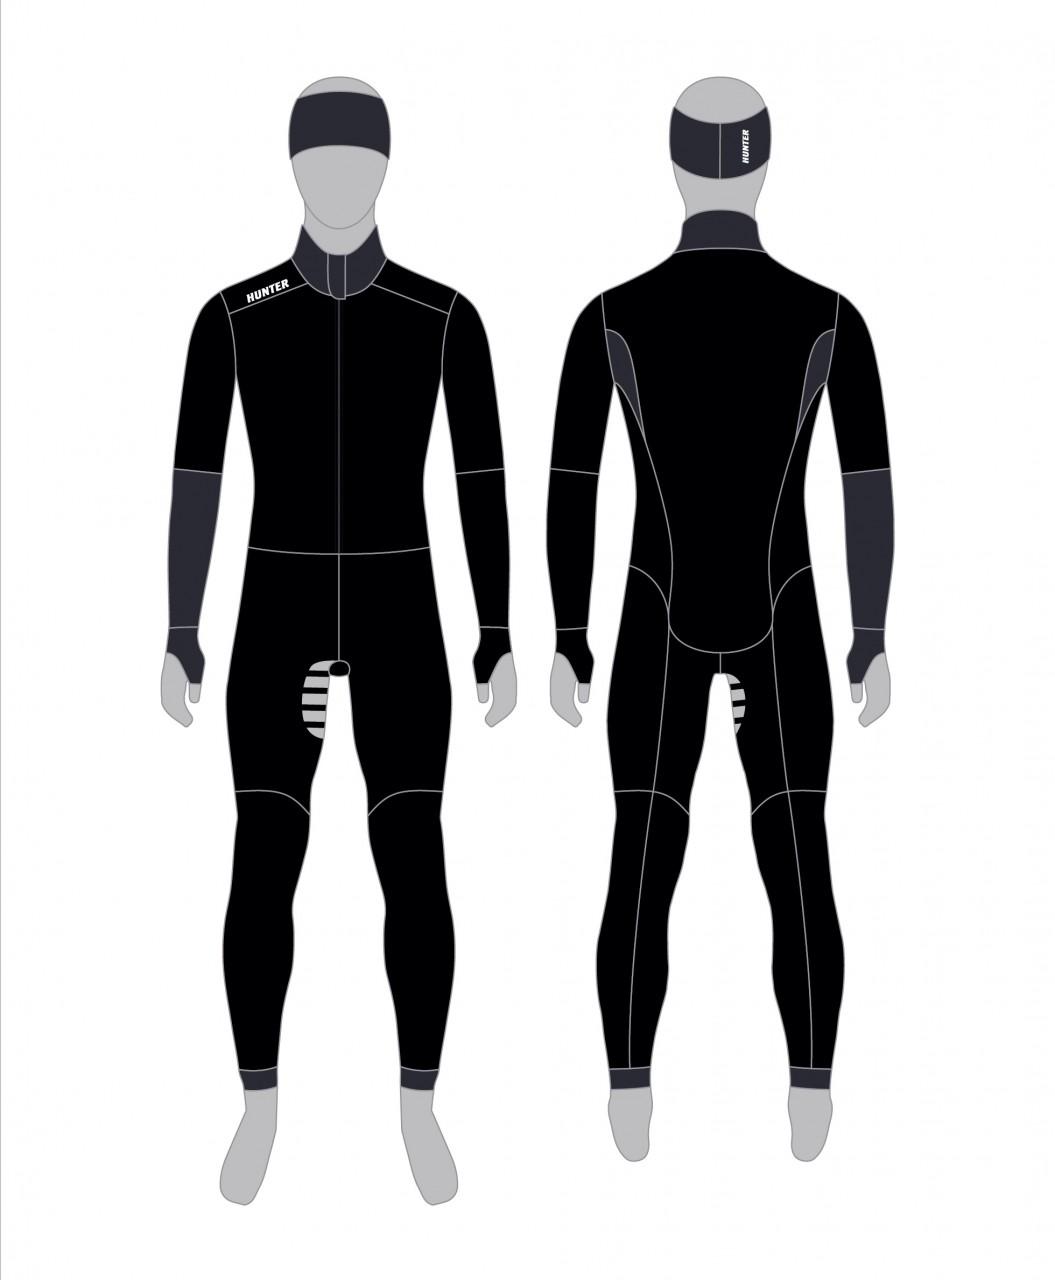 Hunter Thermoanzug ohne Kapuze Modell 2019 grau/schwarz, Base